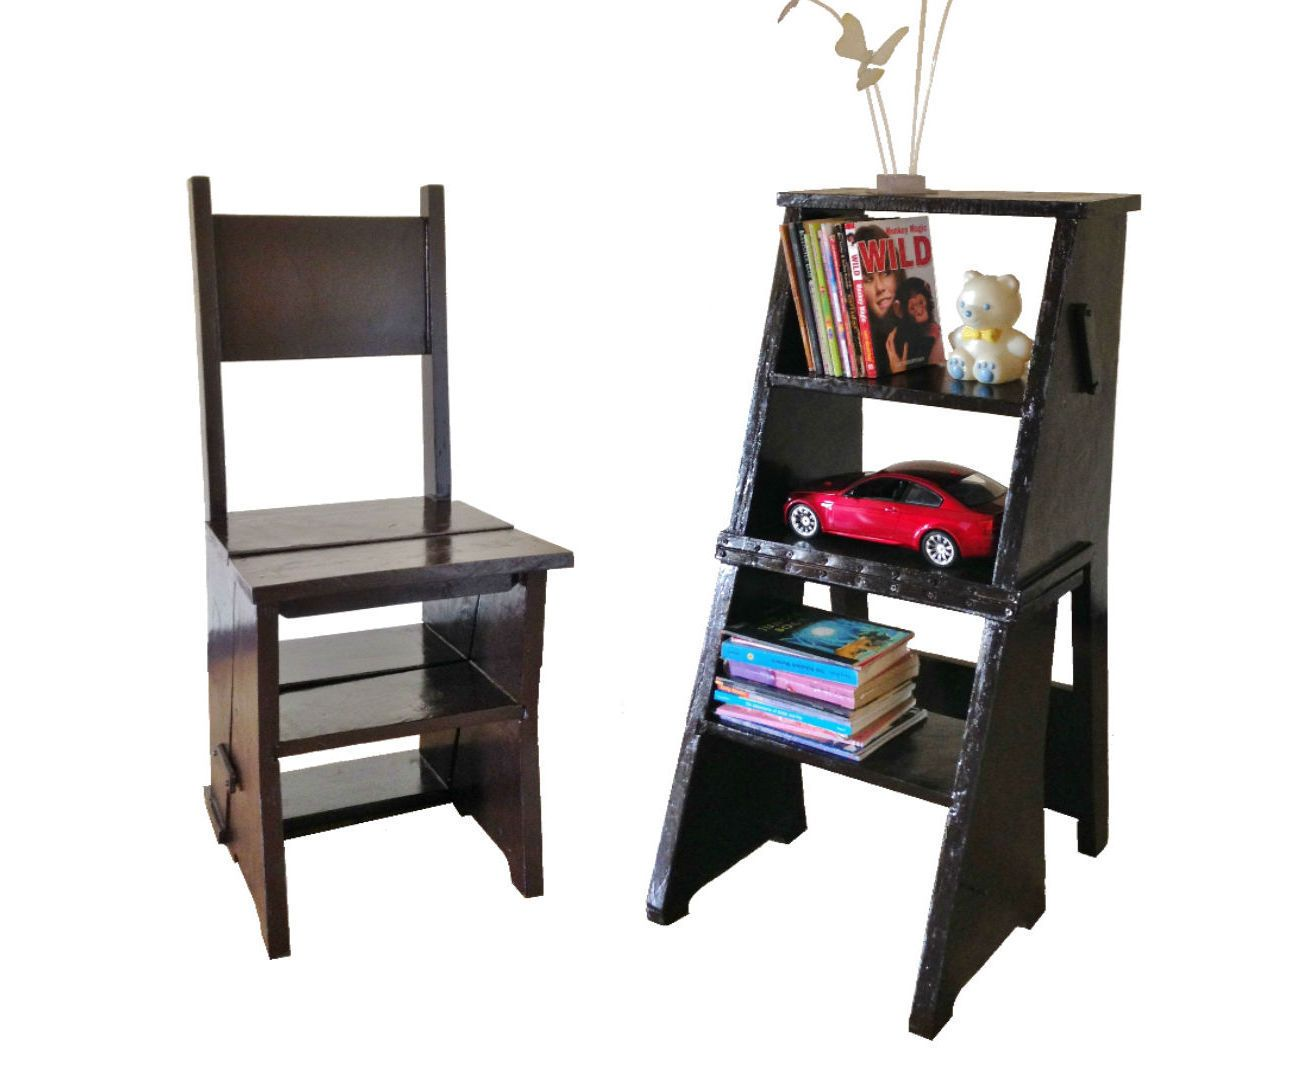 Library chair plans - Crayon 3 Tier Shelving Unit Adr Biblioth Ques Adr Am Nagement D Coration Et Rangement Pinterest Room Ideas Playrooms And Kids Rooms